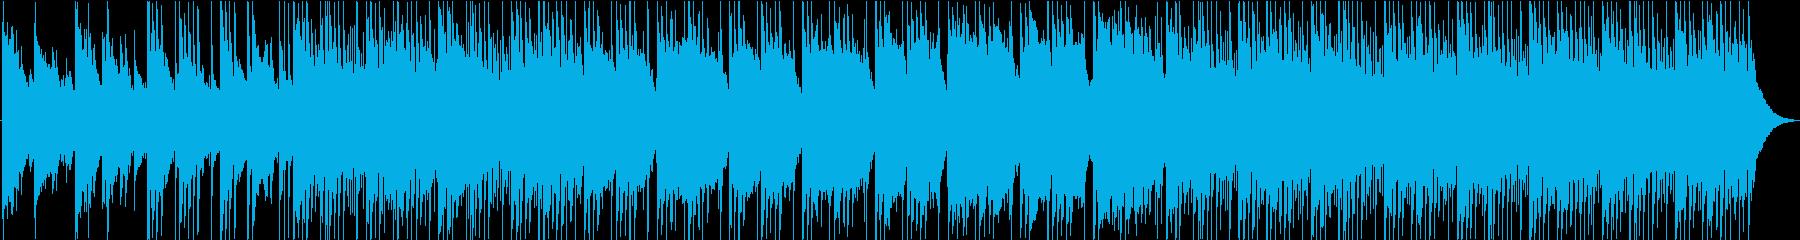 acoustic musicの再生済みの波形